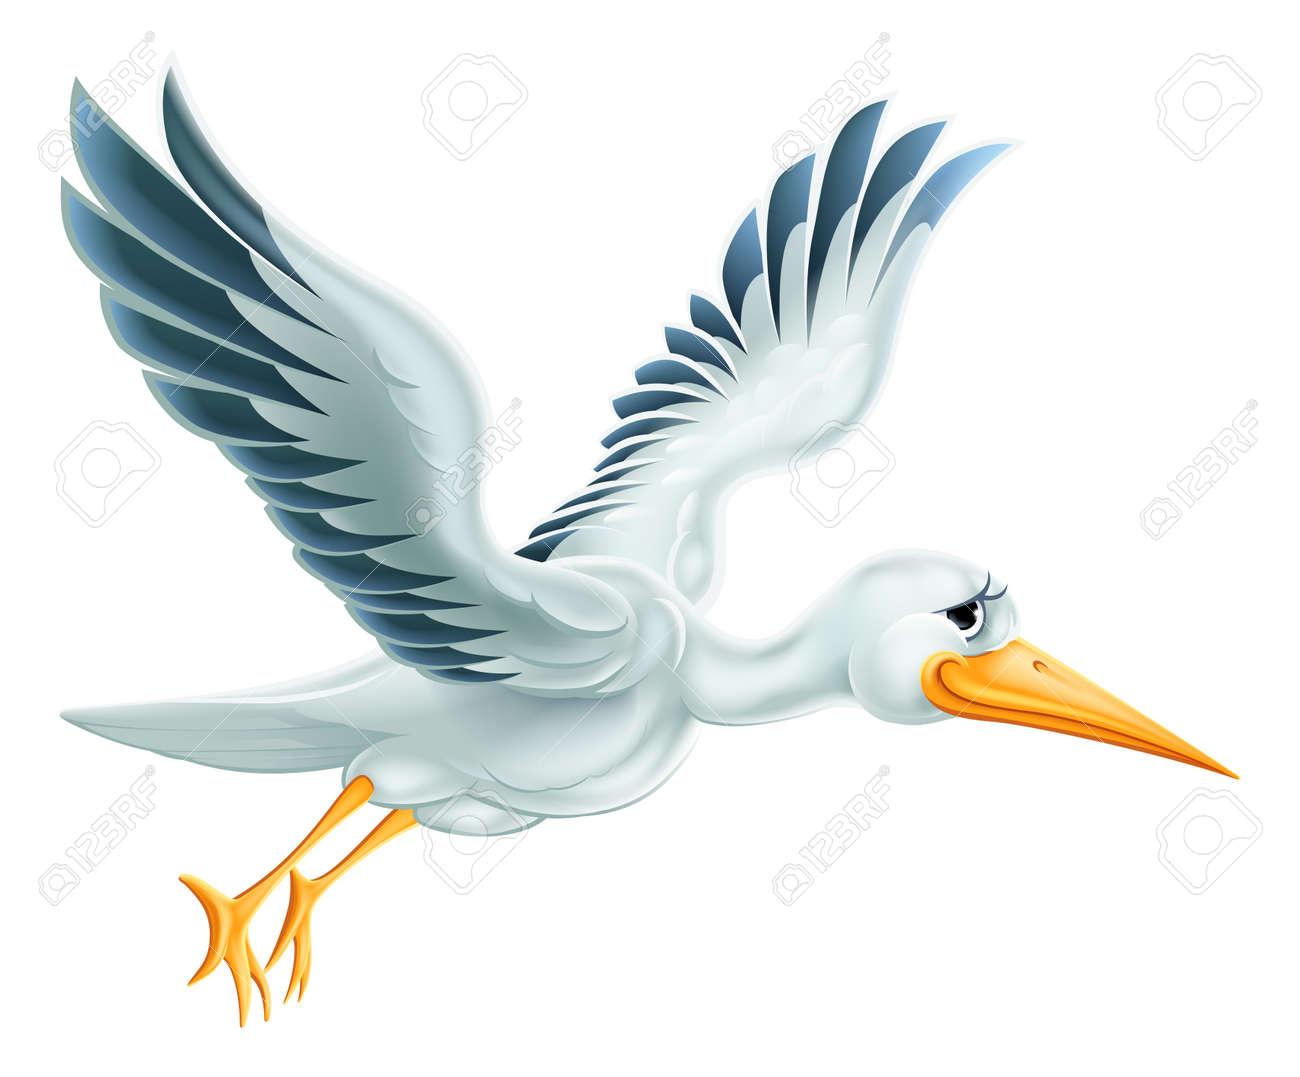 An illustration of a cute cartoon Stork bird character flying through the air - 36299009